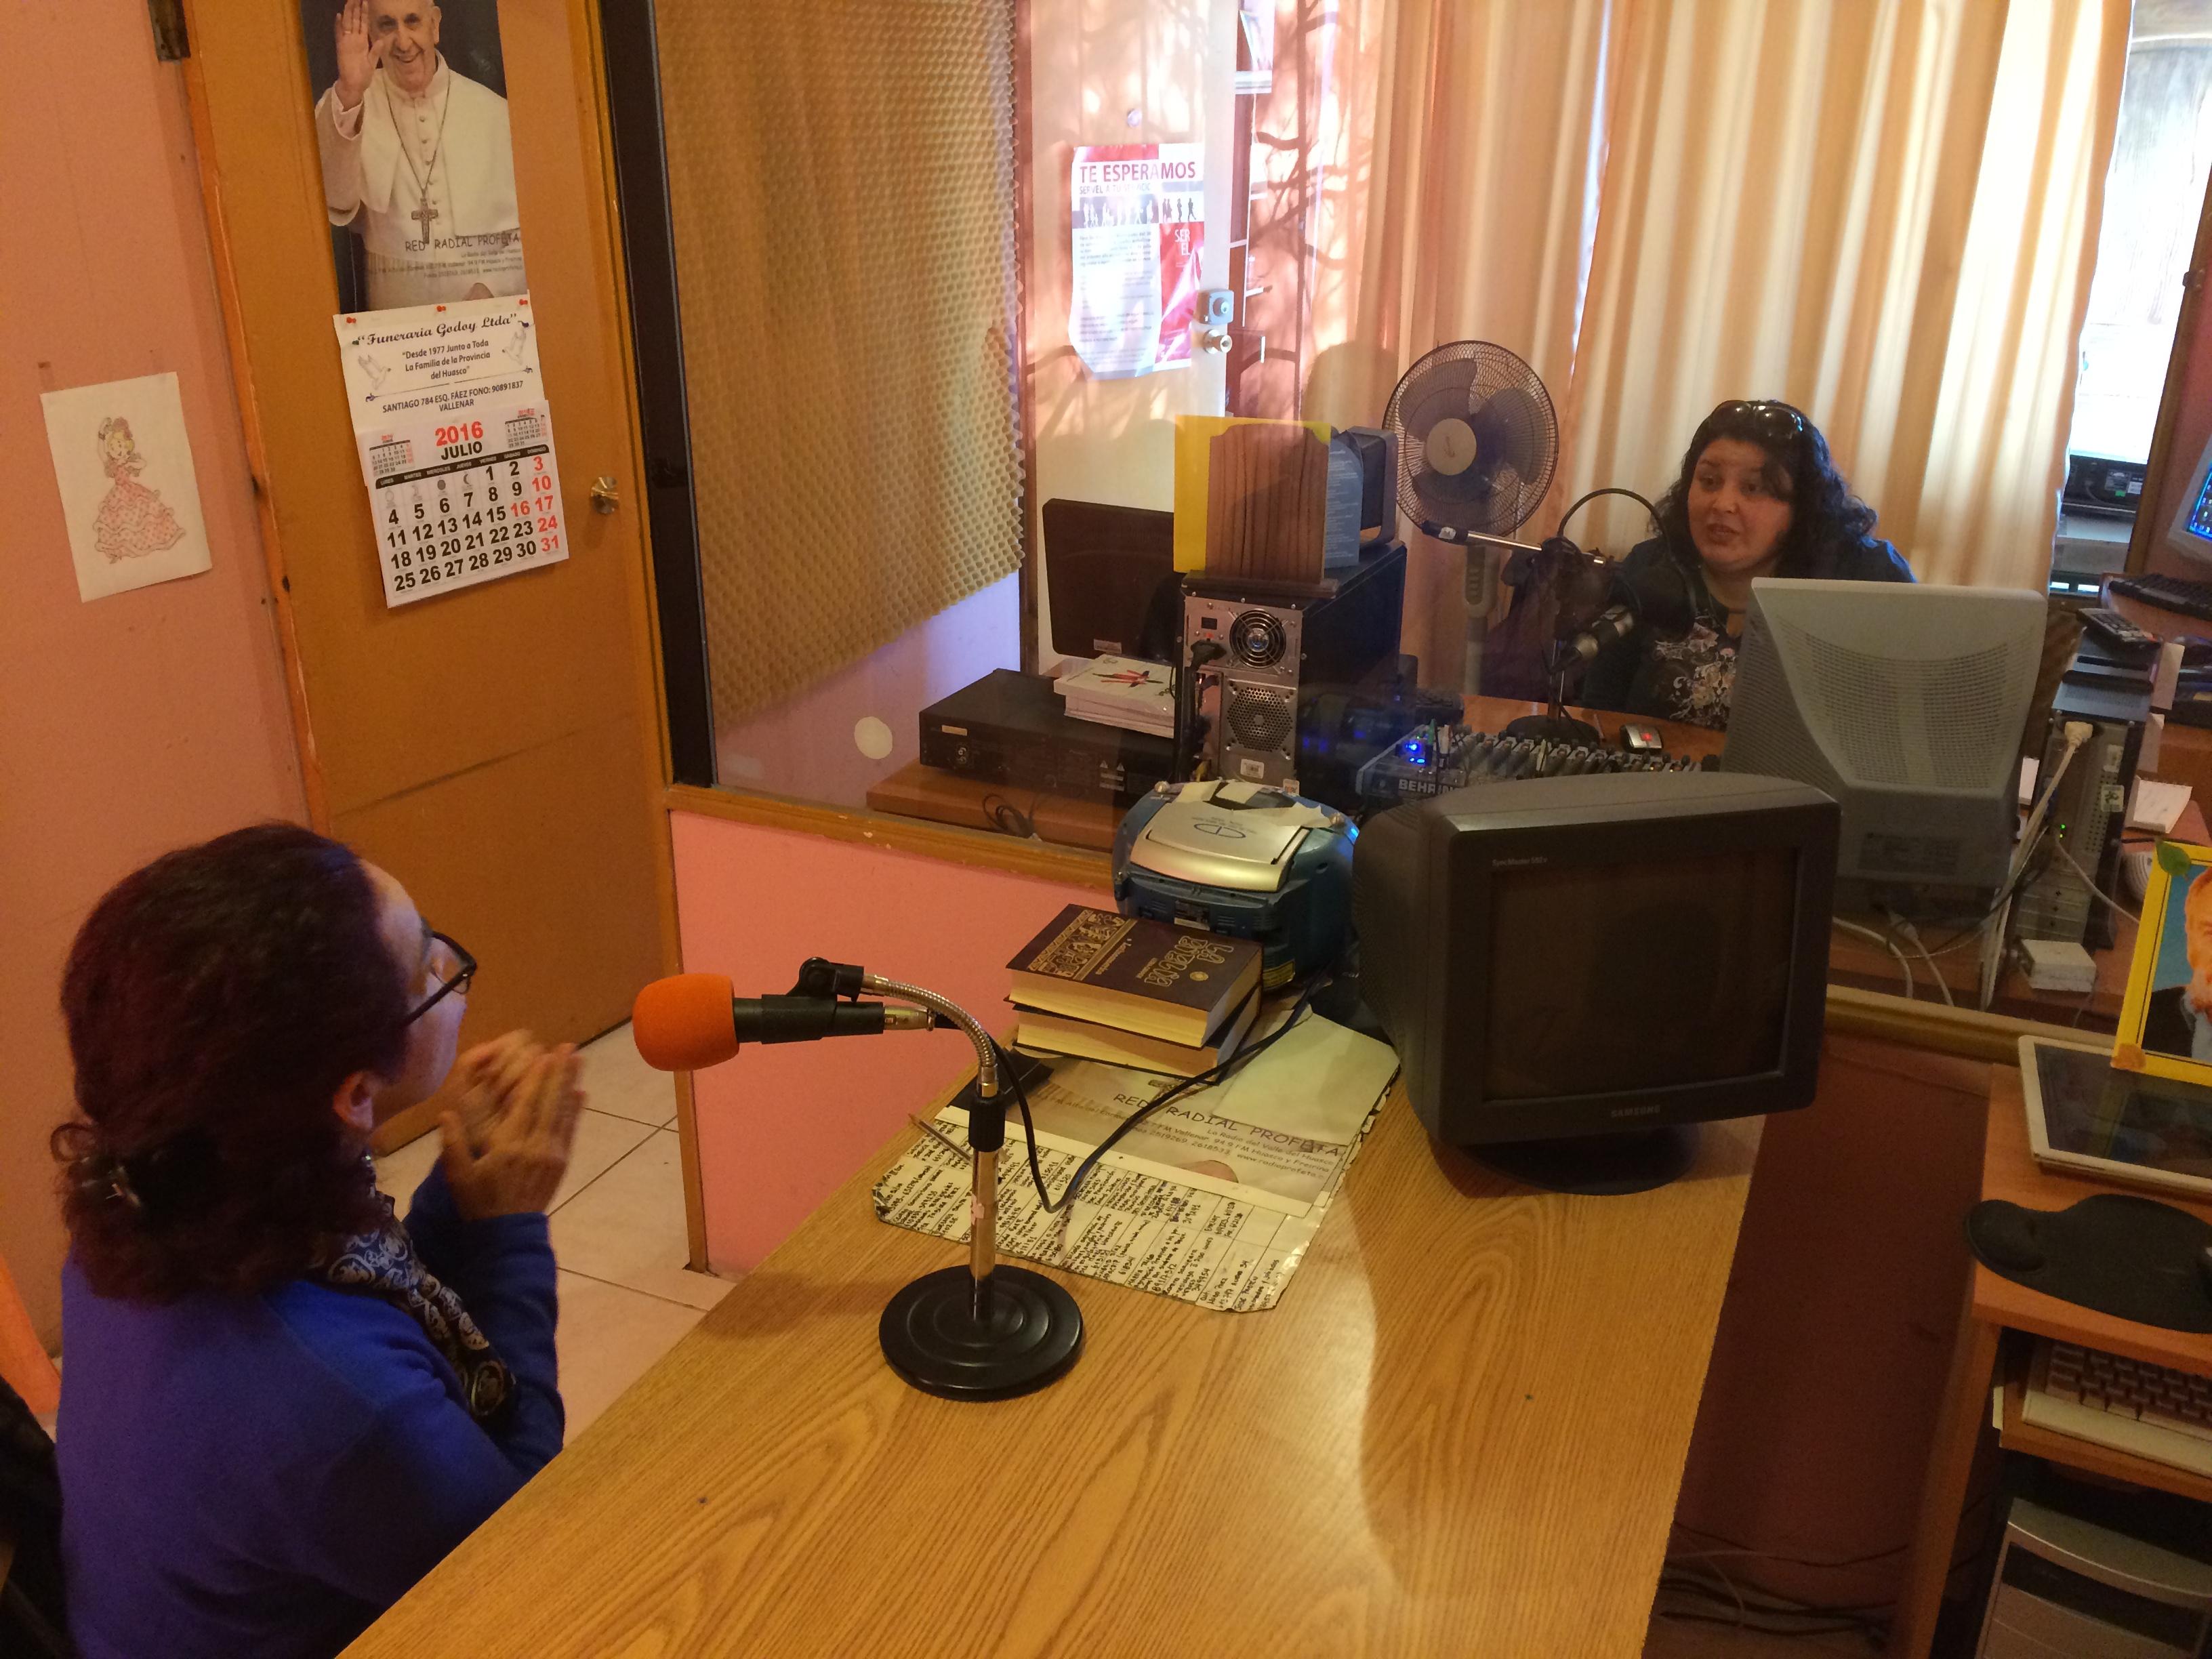 Gobernadora del Huasco releva importancia de cabildos provinciales